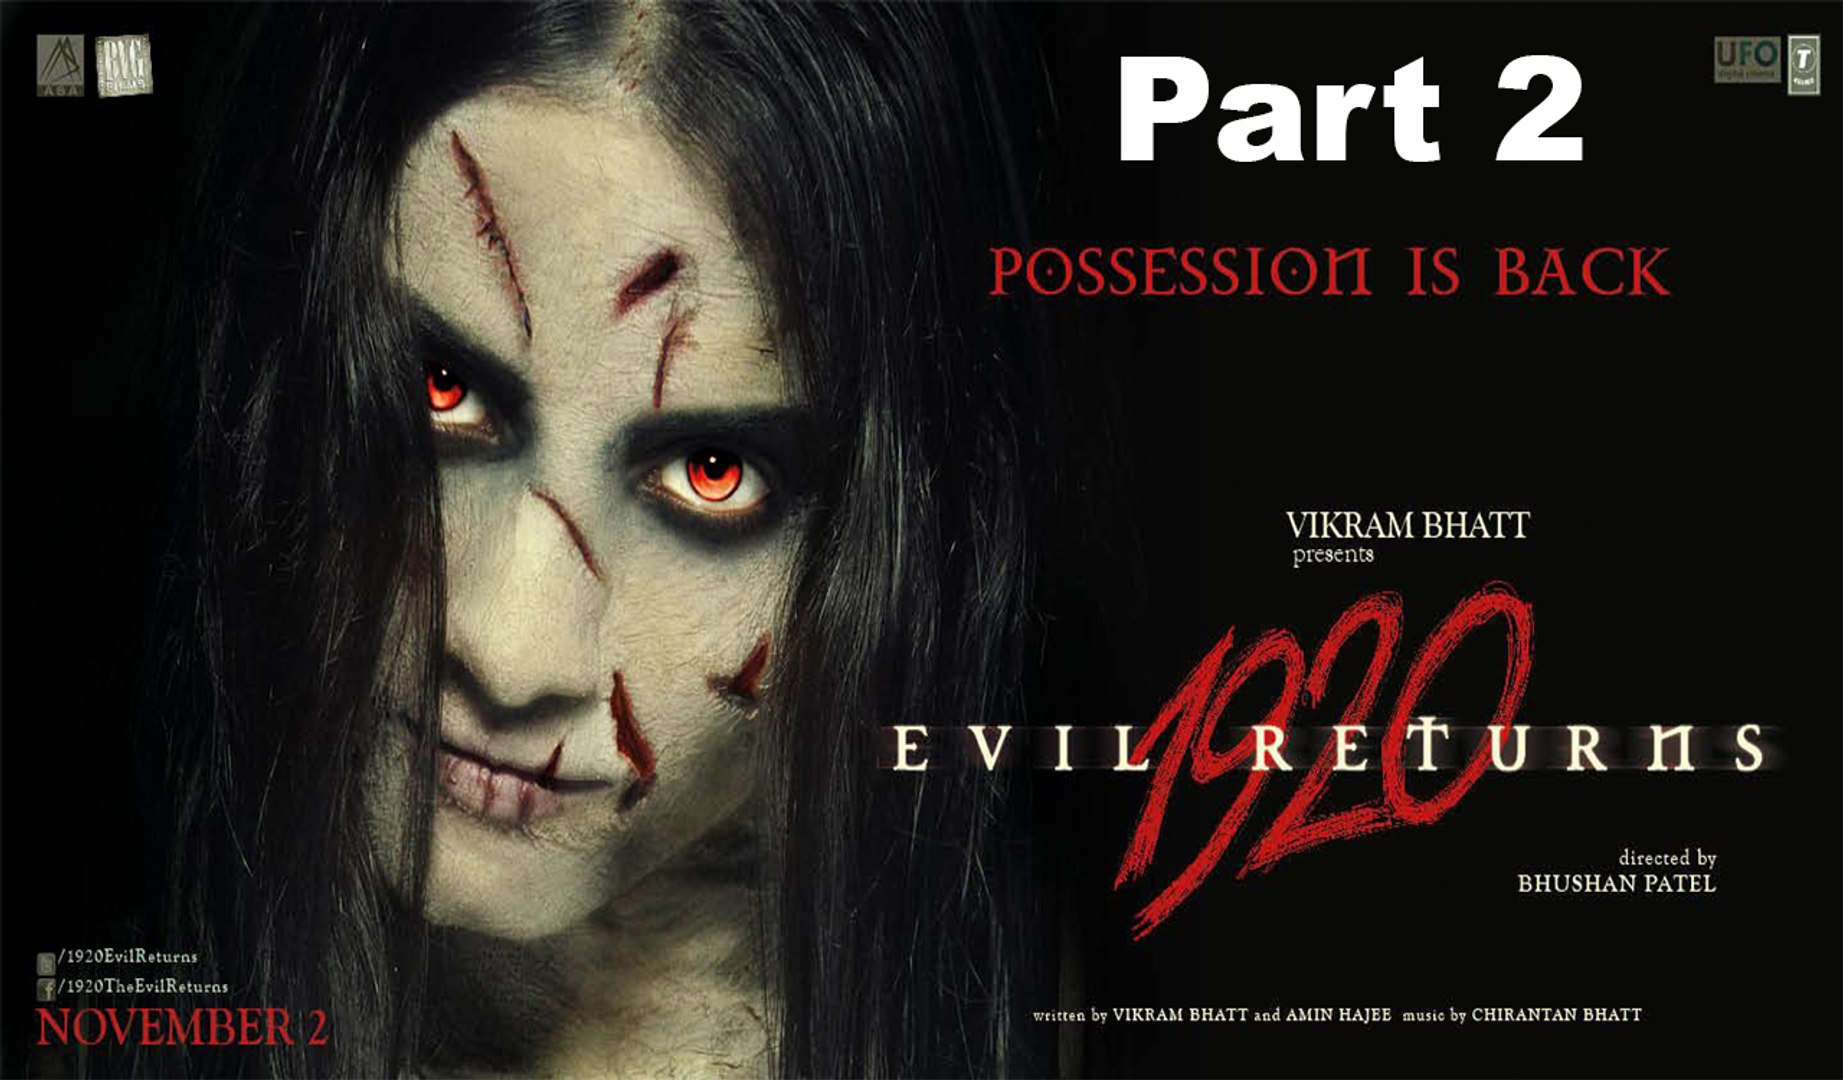 1920 evil returns full movie watch online free